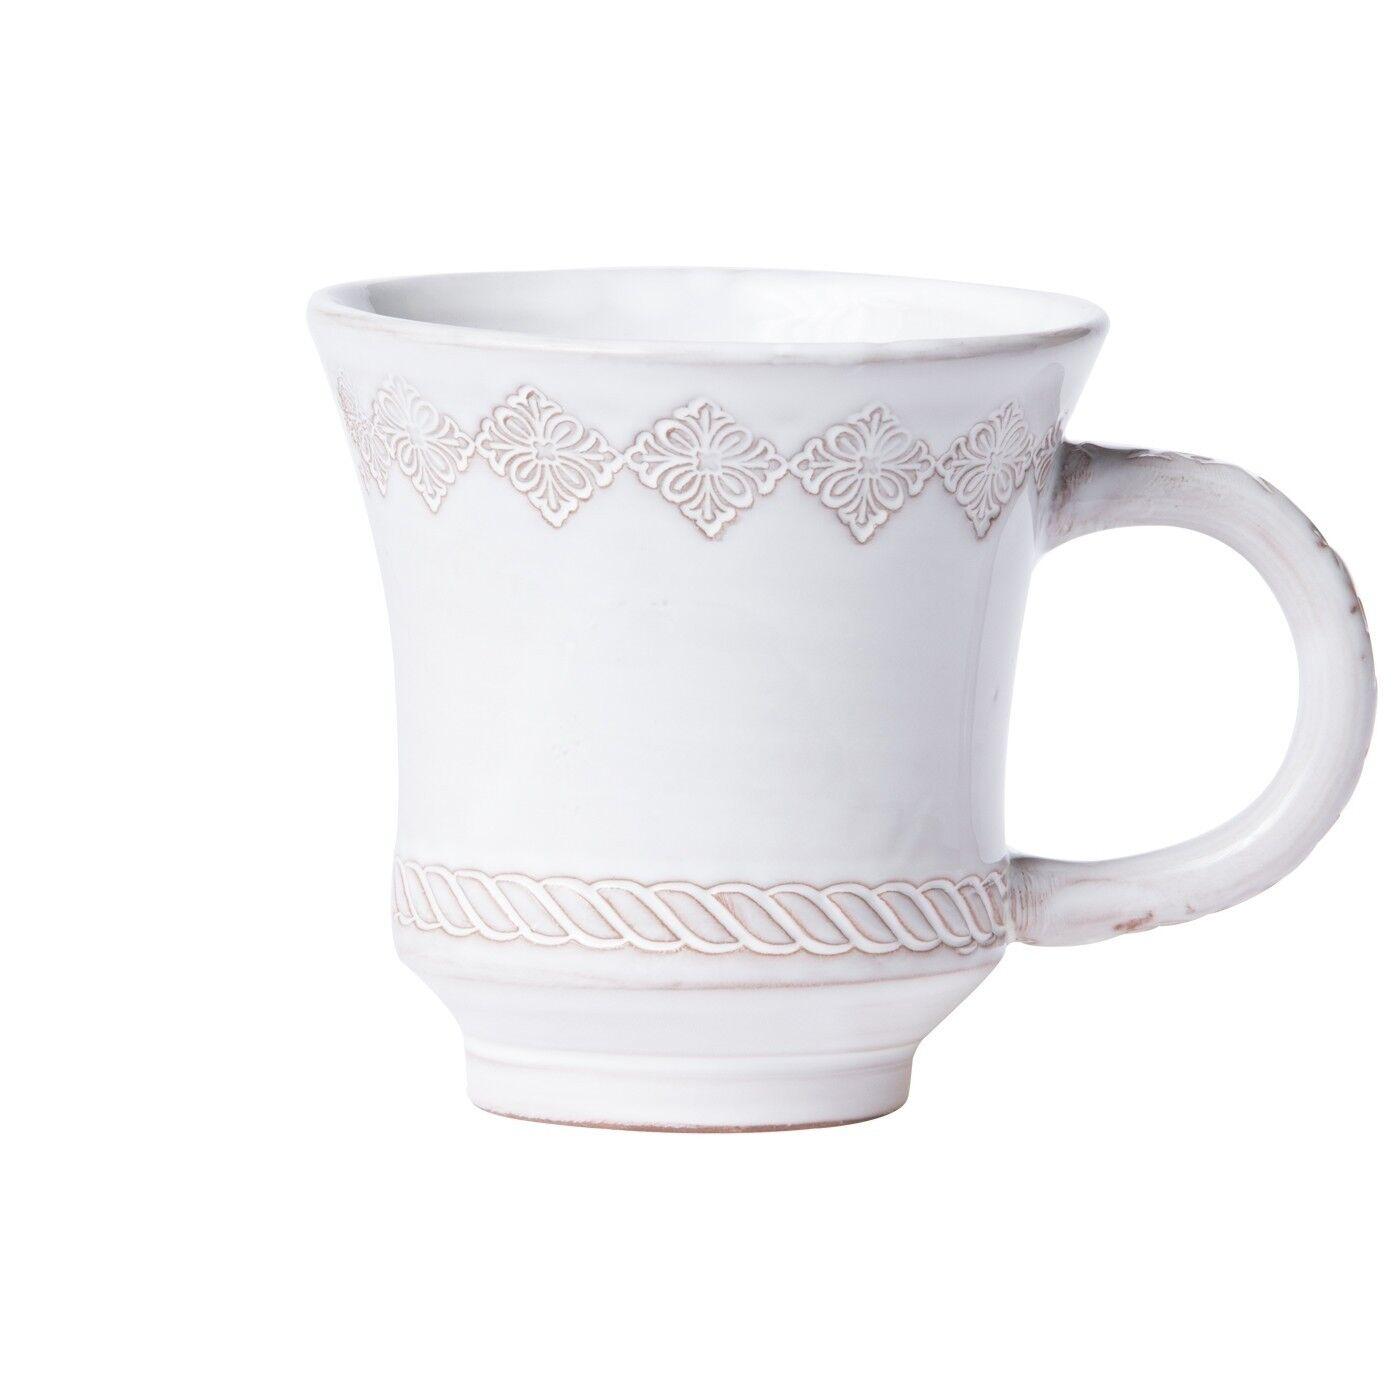 Vietri Bellezza Stone blanc Mug - Set of 4